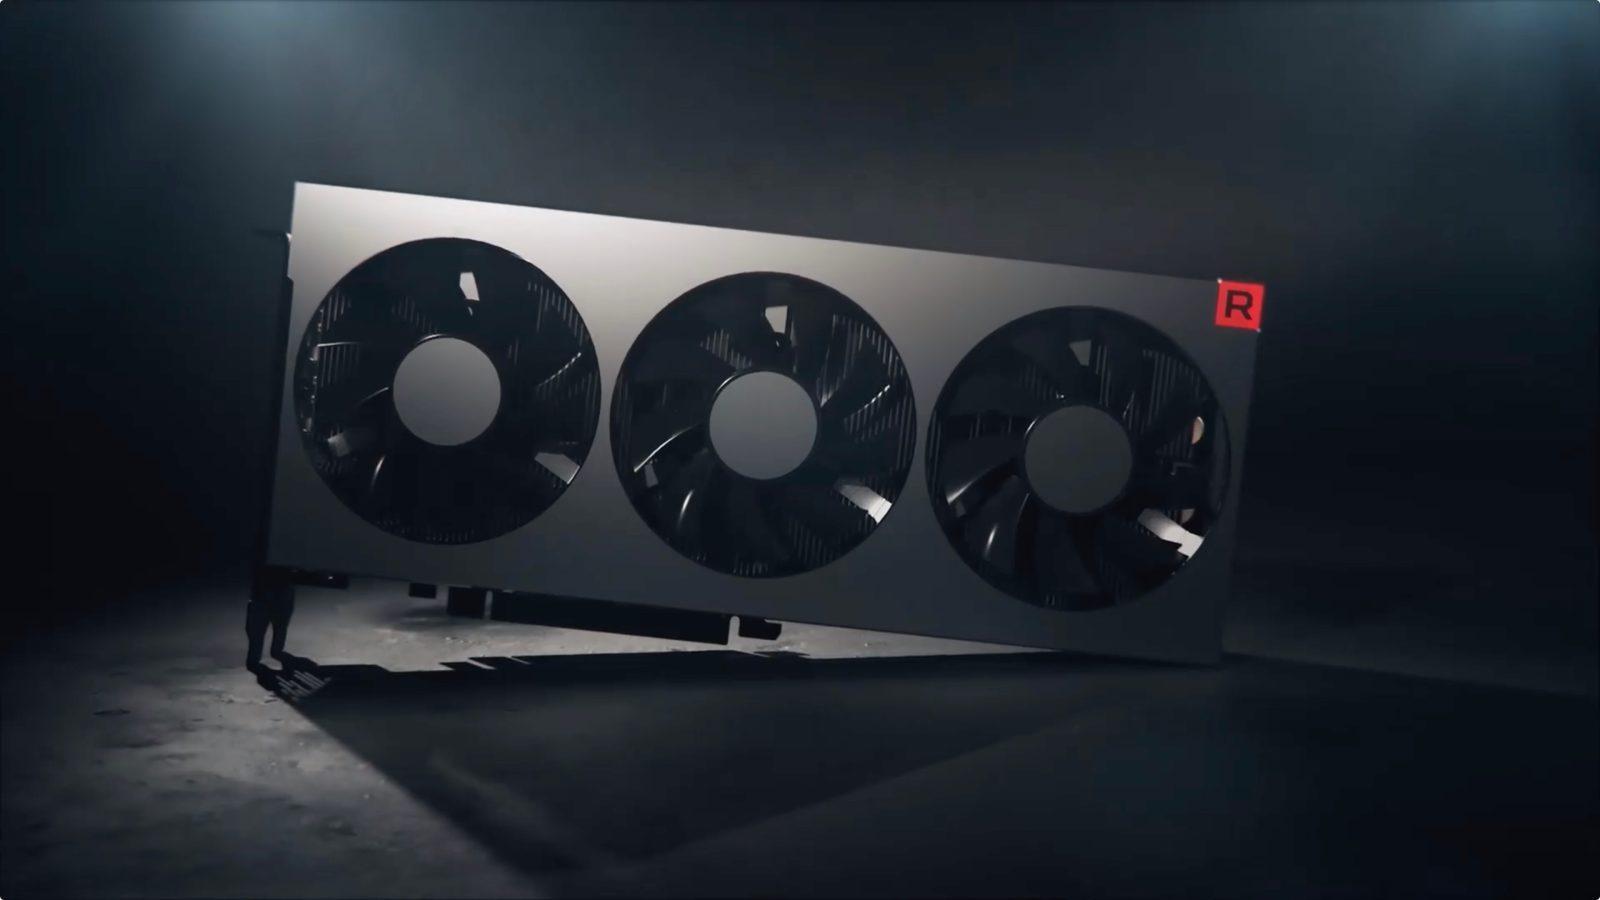 AMD Radeon VII AMD New High-End GPU Announced at CES